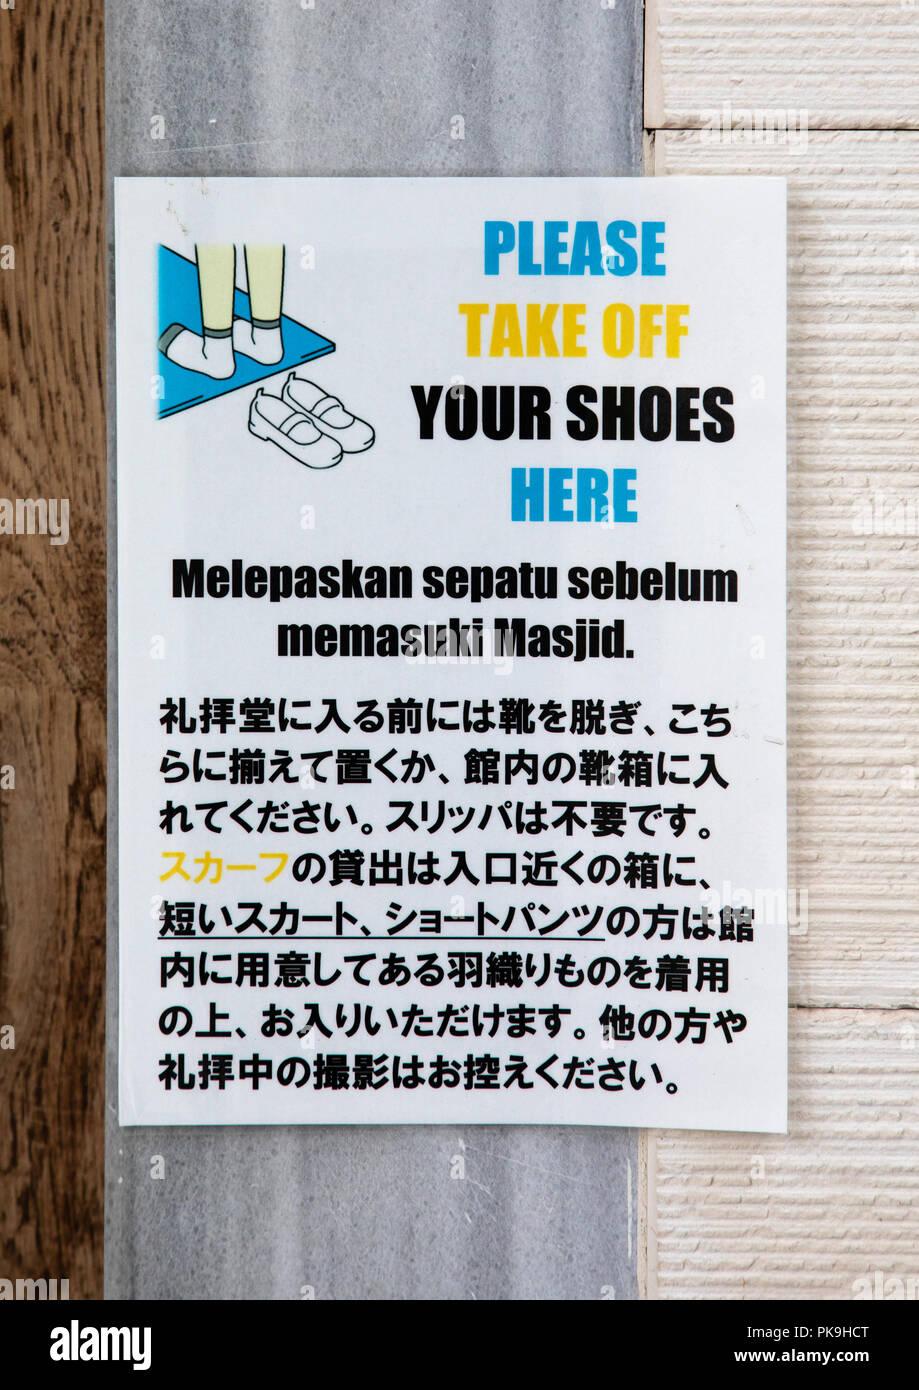 Take off your shoes waribng billboard in Oyama-cho Tokyo Camii mosque, Kanto region, Tokyo, Japan - Stock Image